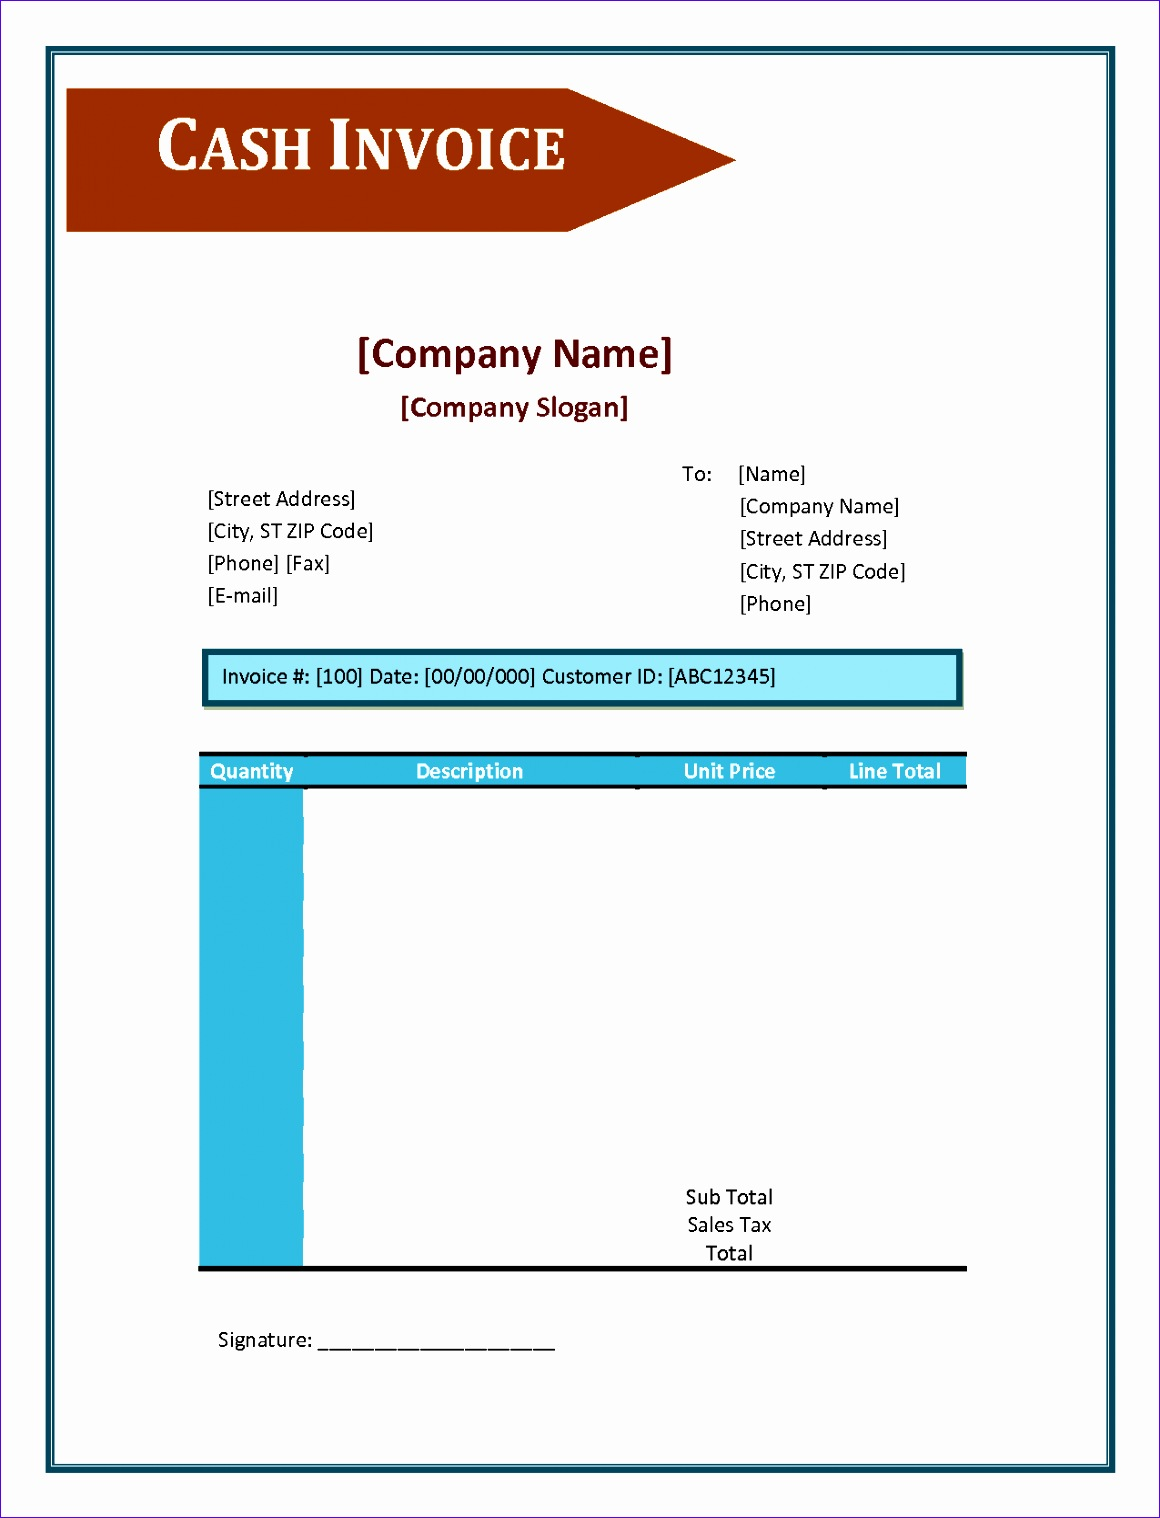 cash invoice template excel 1271 11601518